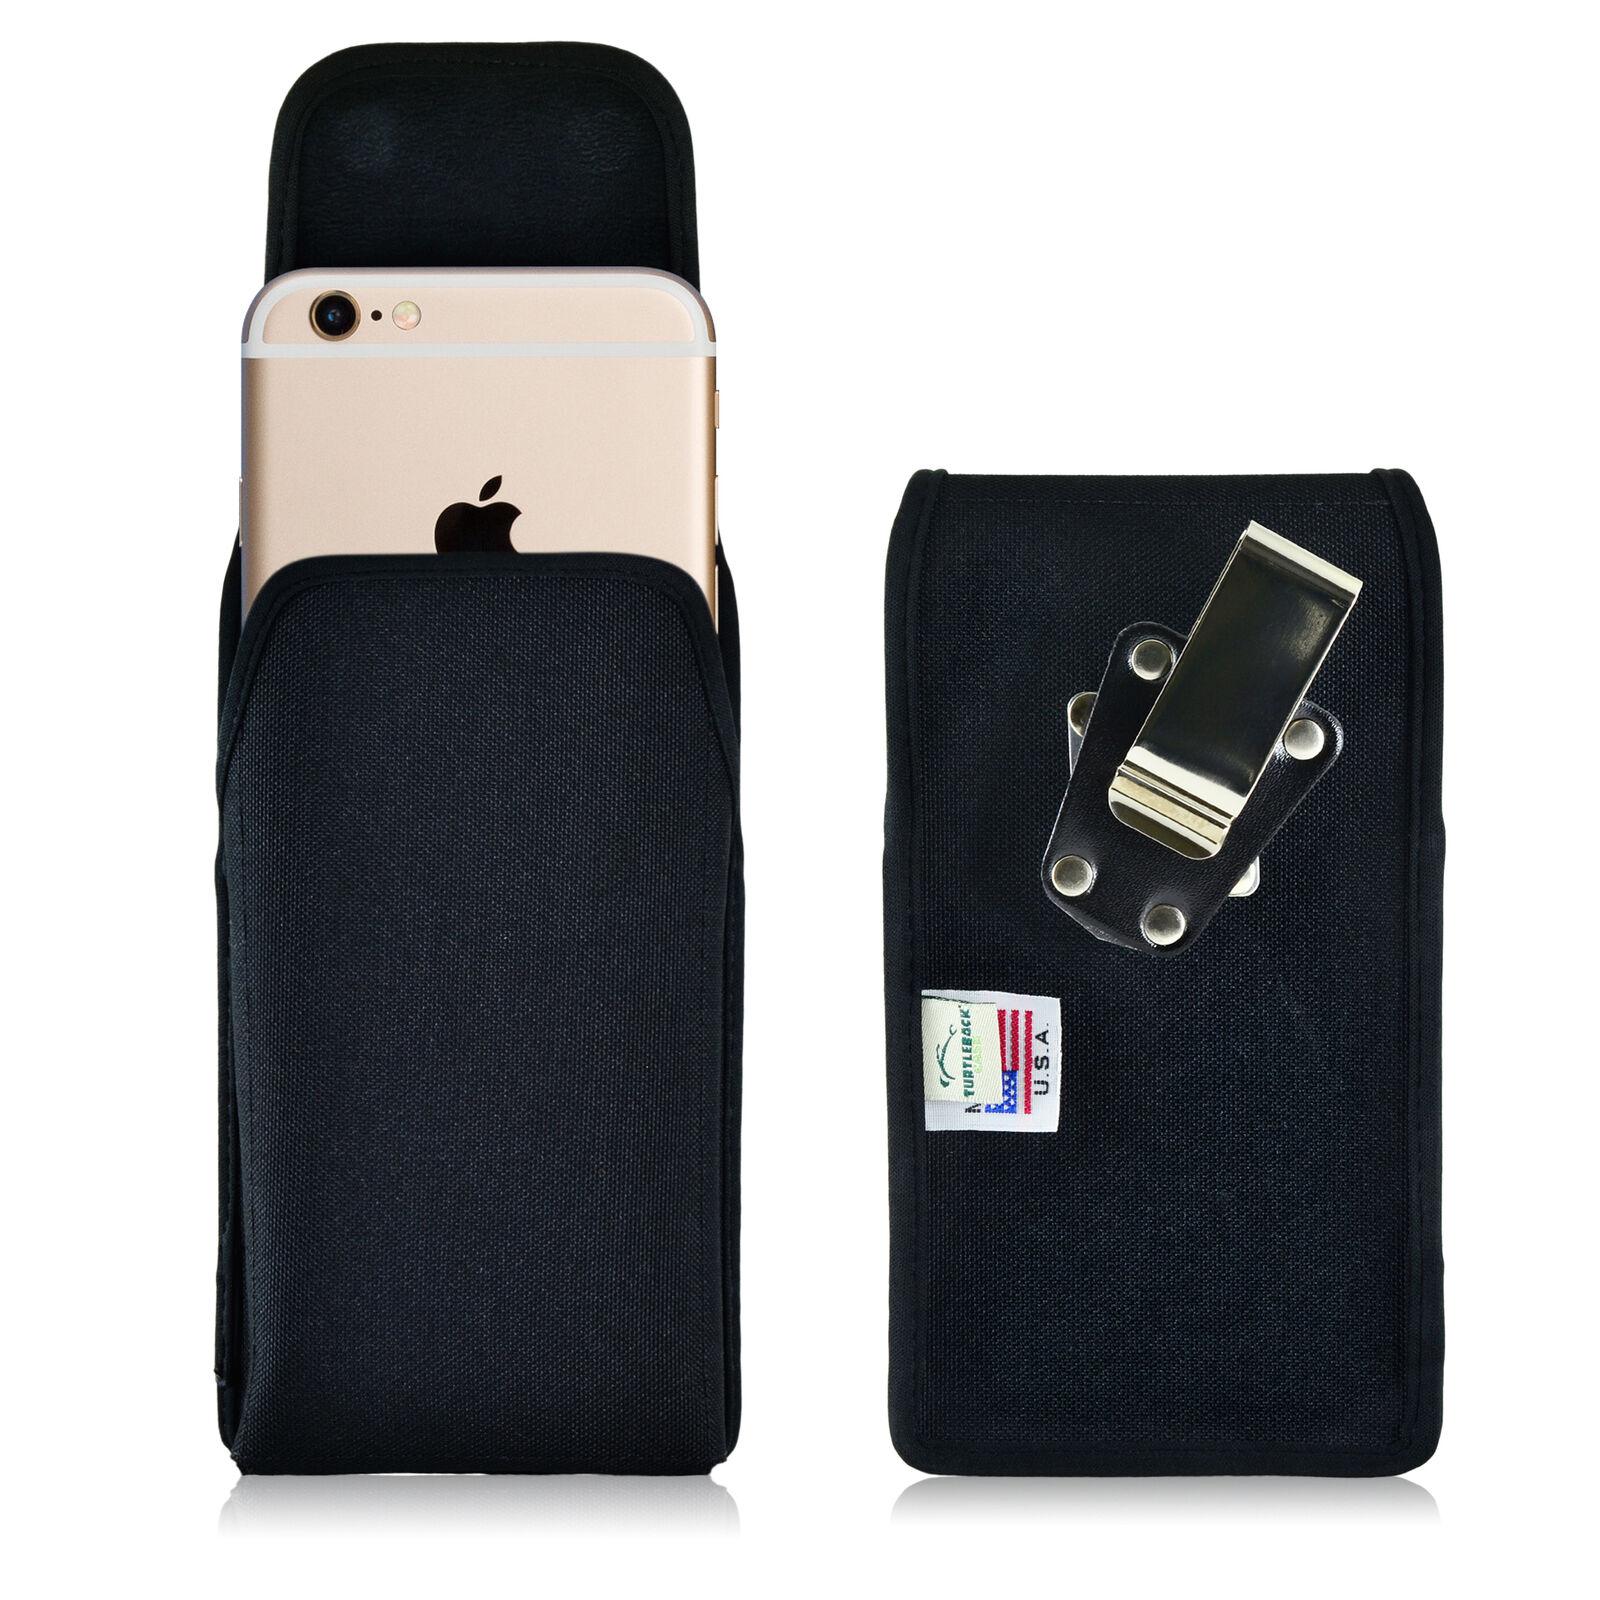 turtleback-apple-iphone-6s-plus-nylon-vertical-holster-phone-case-metal-clip